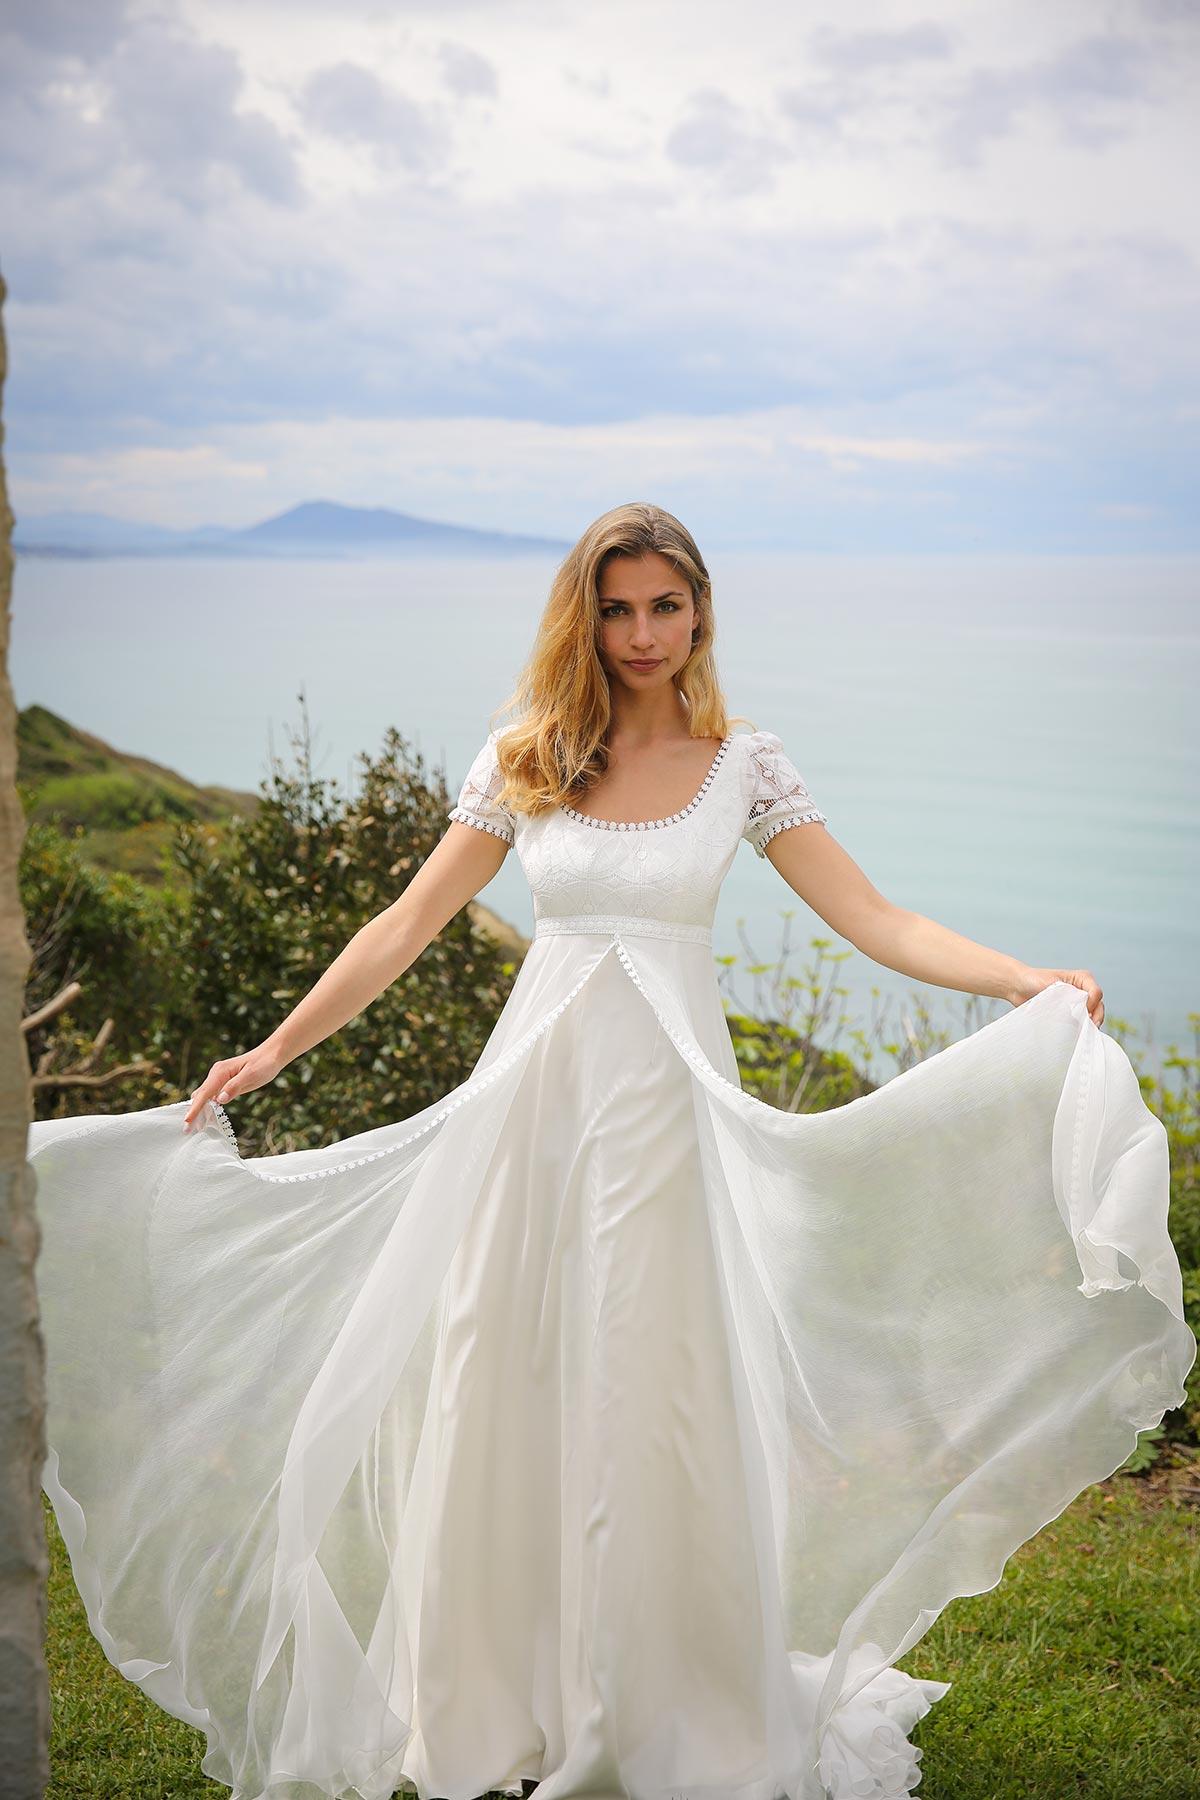 lorette-2N2A6301-marie-laporte-creatrice-robe-mariee-2017